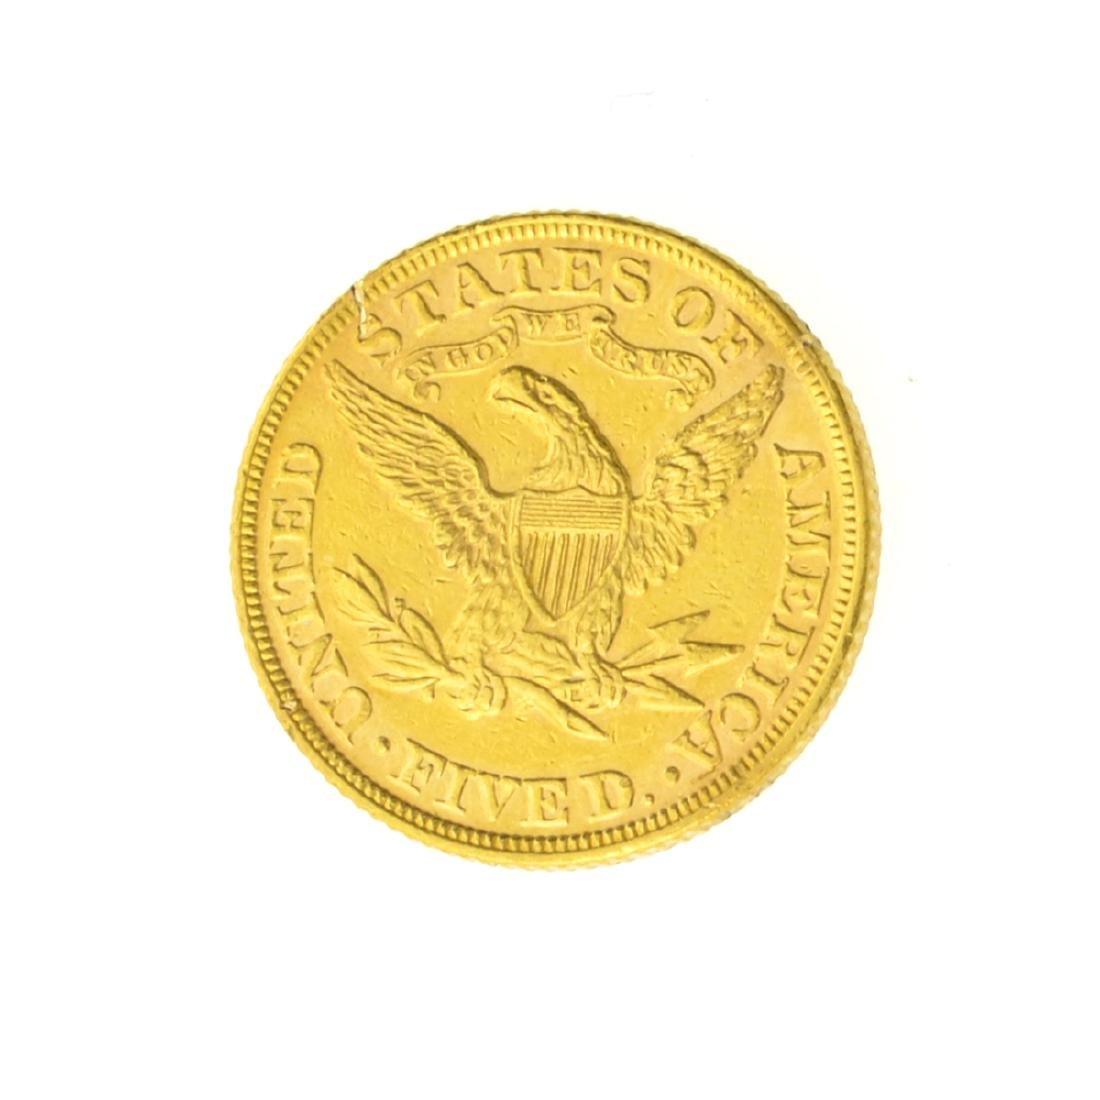 1895 $5.00 U.S. Liberty Head Gold Coin - 2